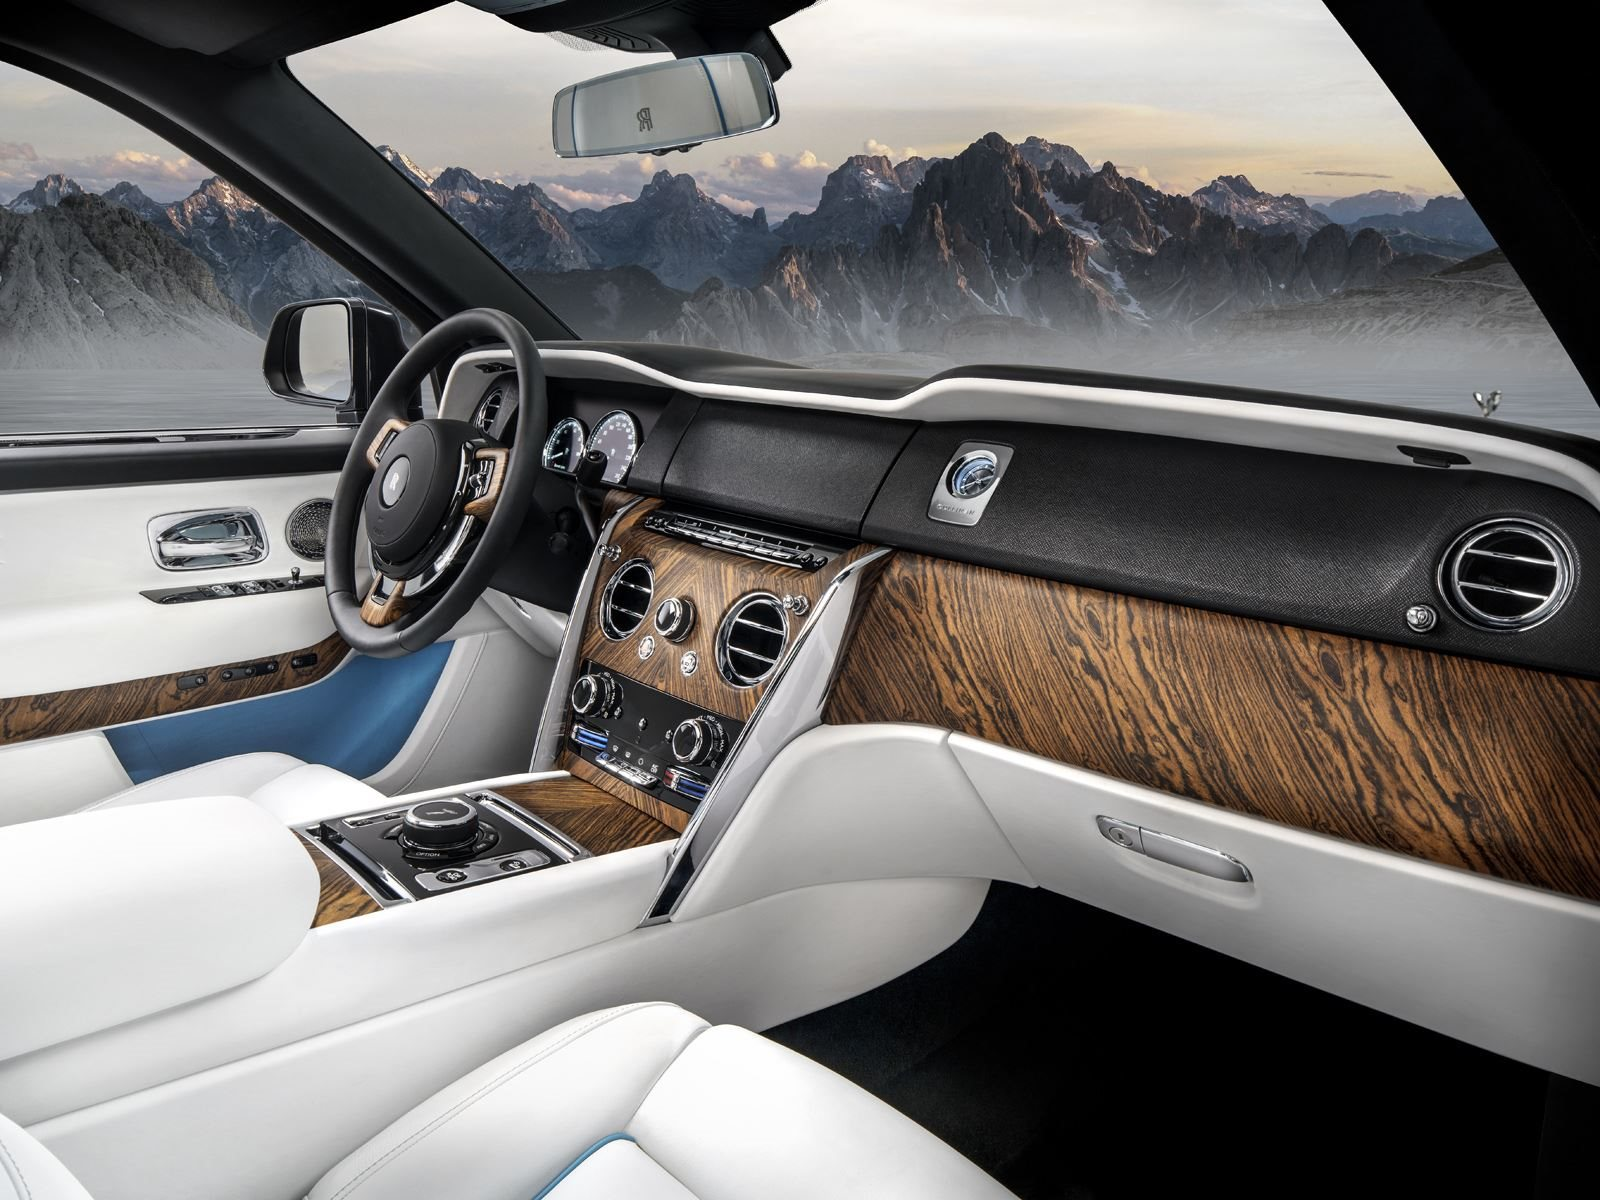 10 dieu co the ban chua biet ve 'sieu SUV' Rolls-Royce Cullinan